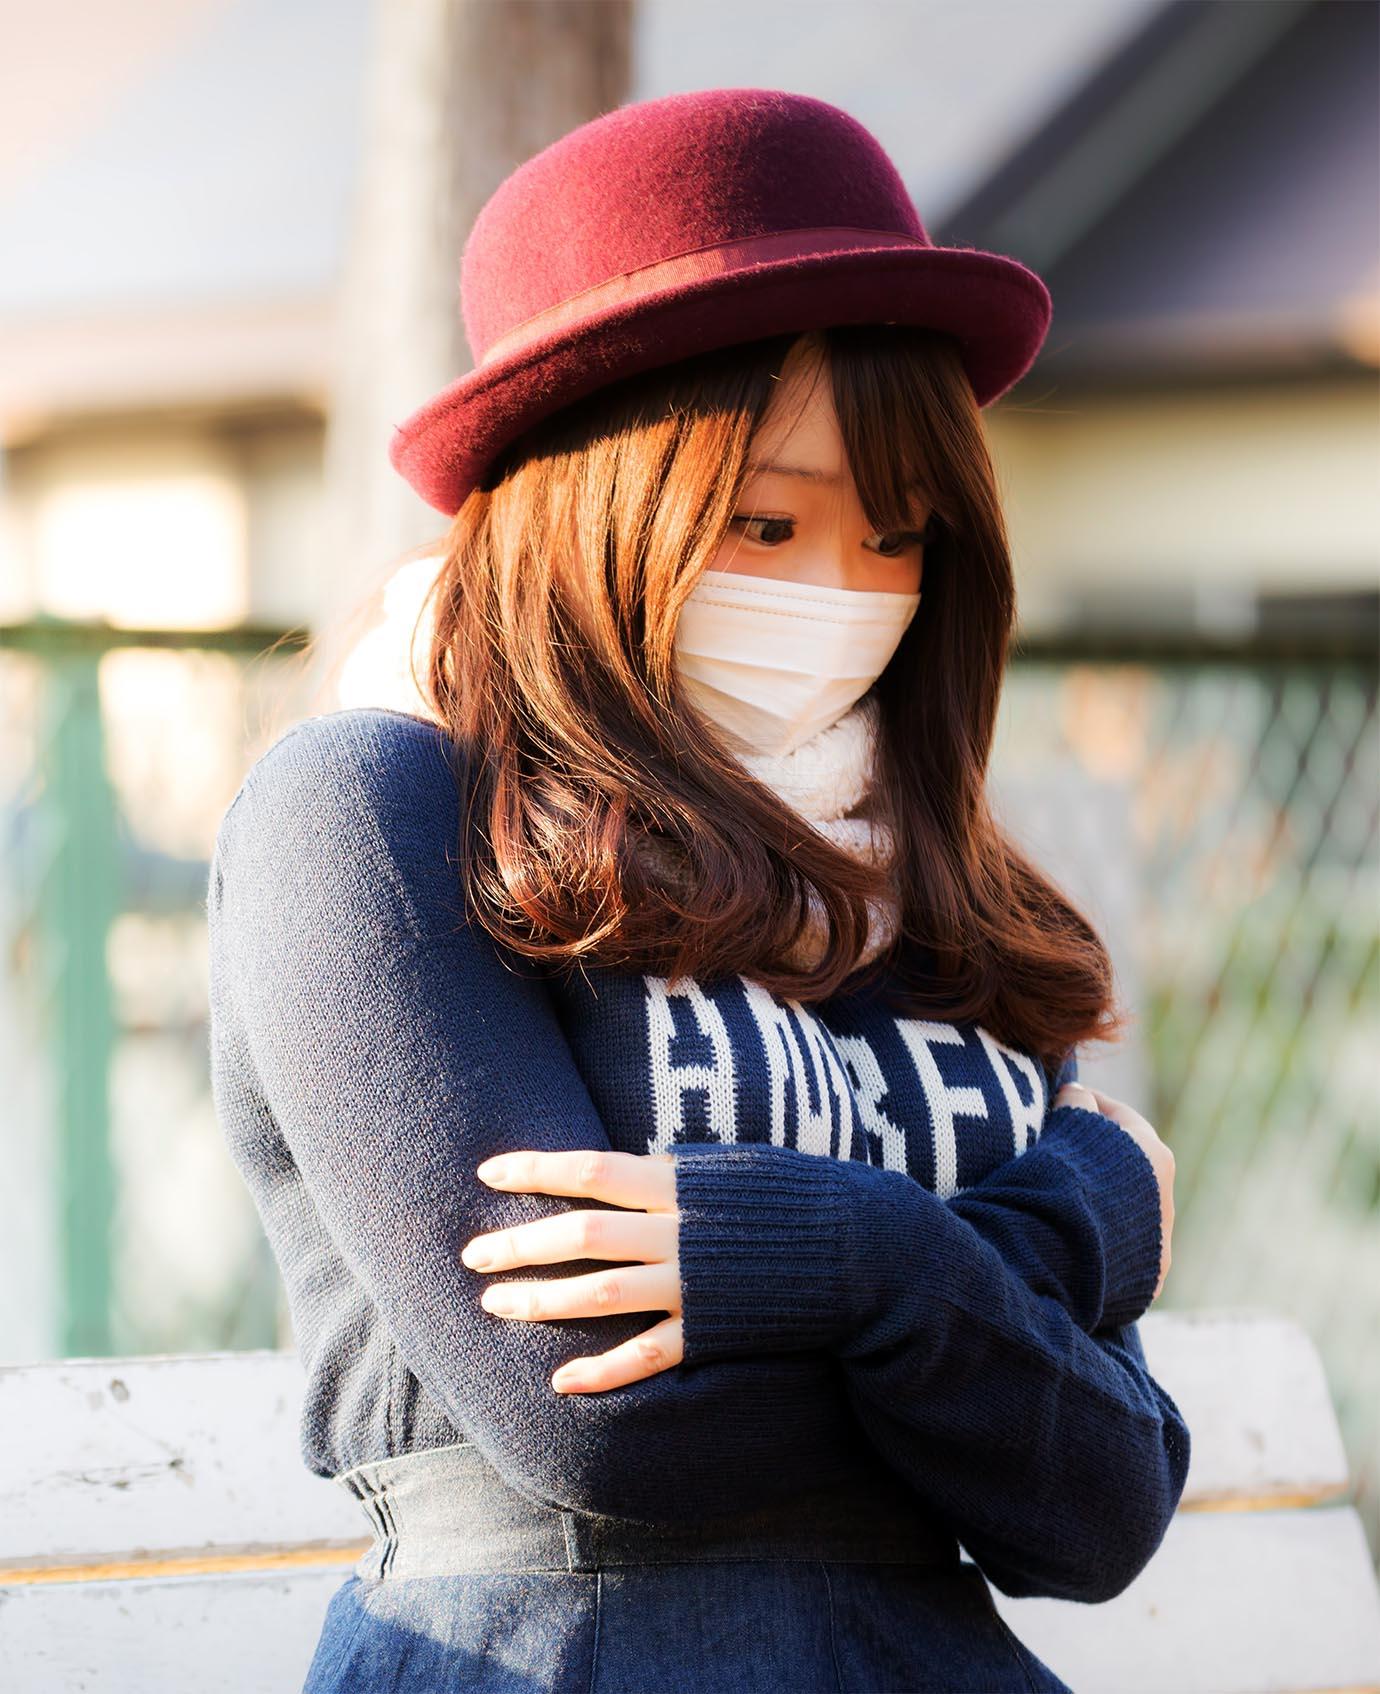 influenza-occurs-twice-news